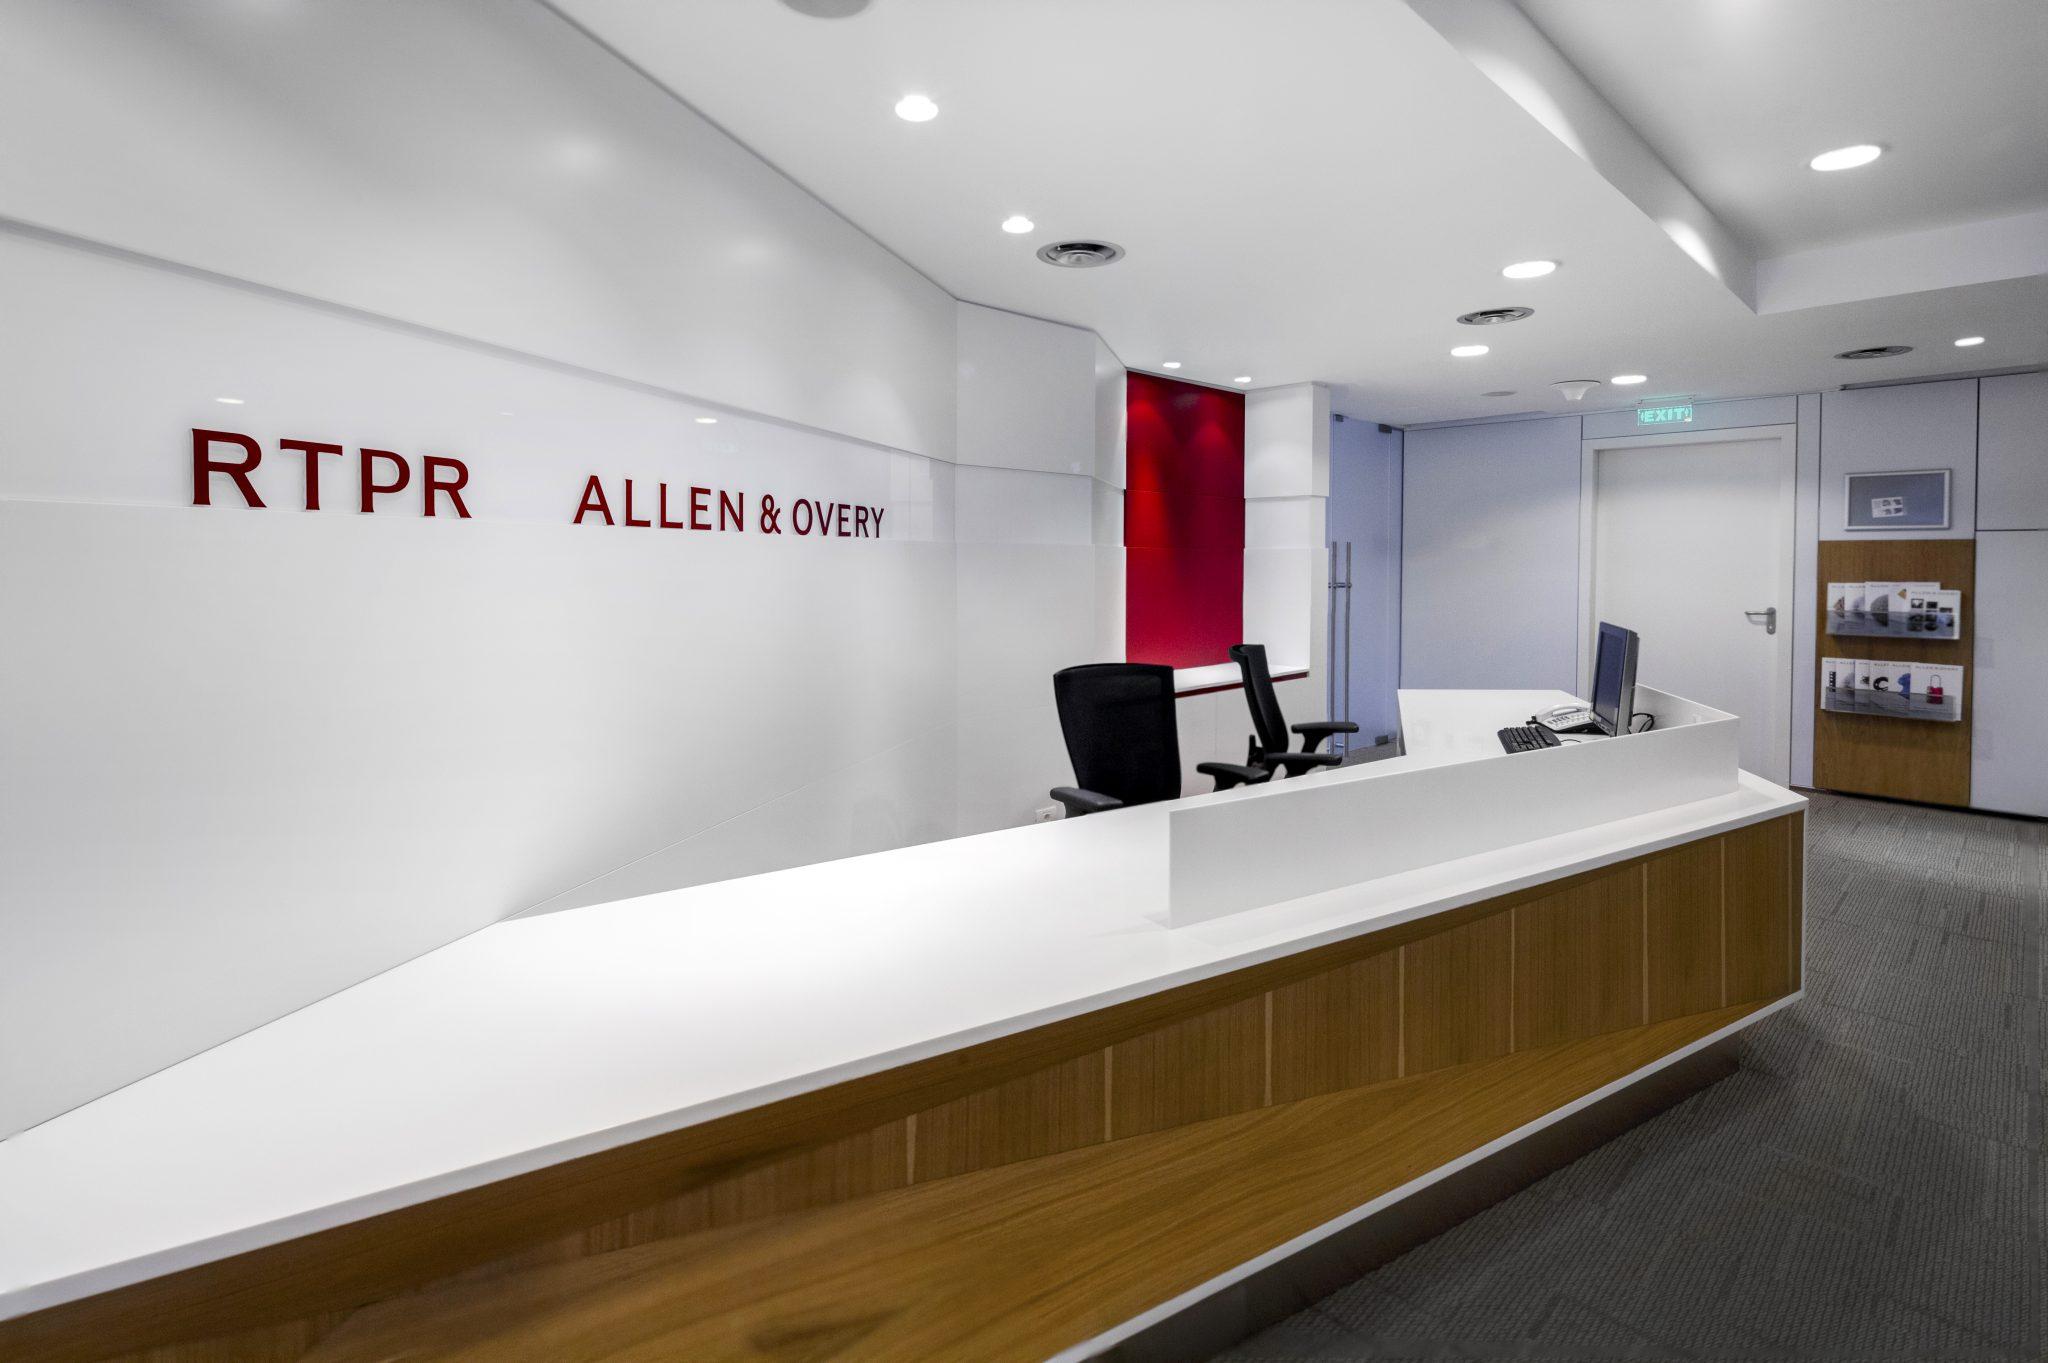 RTPR Allen & Overy din nou în topul clasamentului Chambers Global